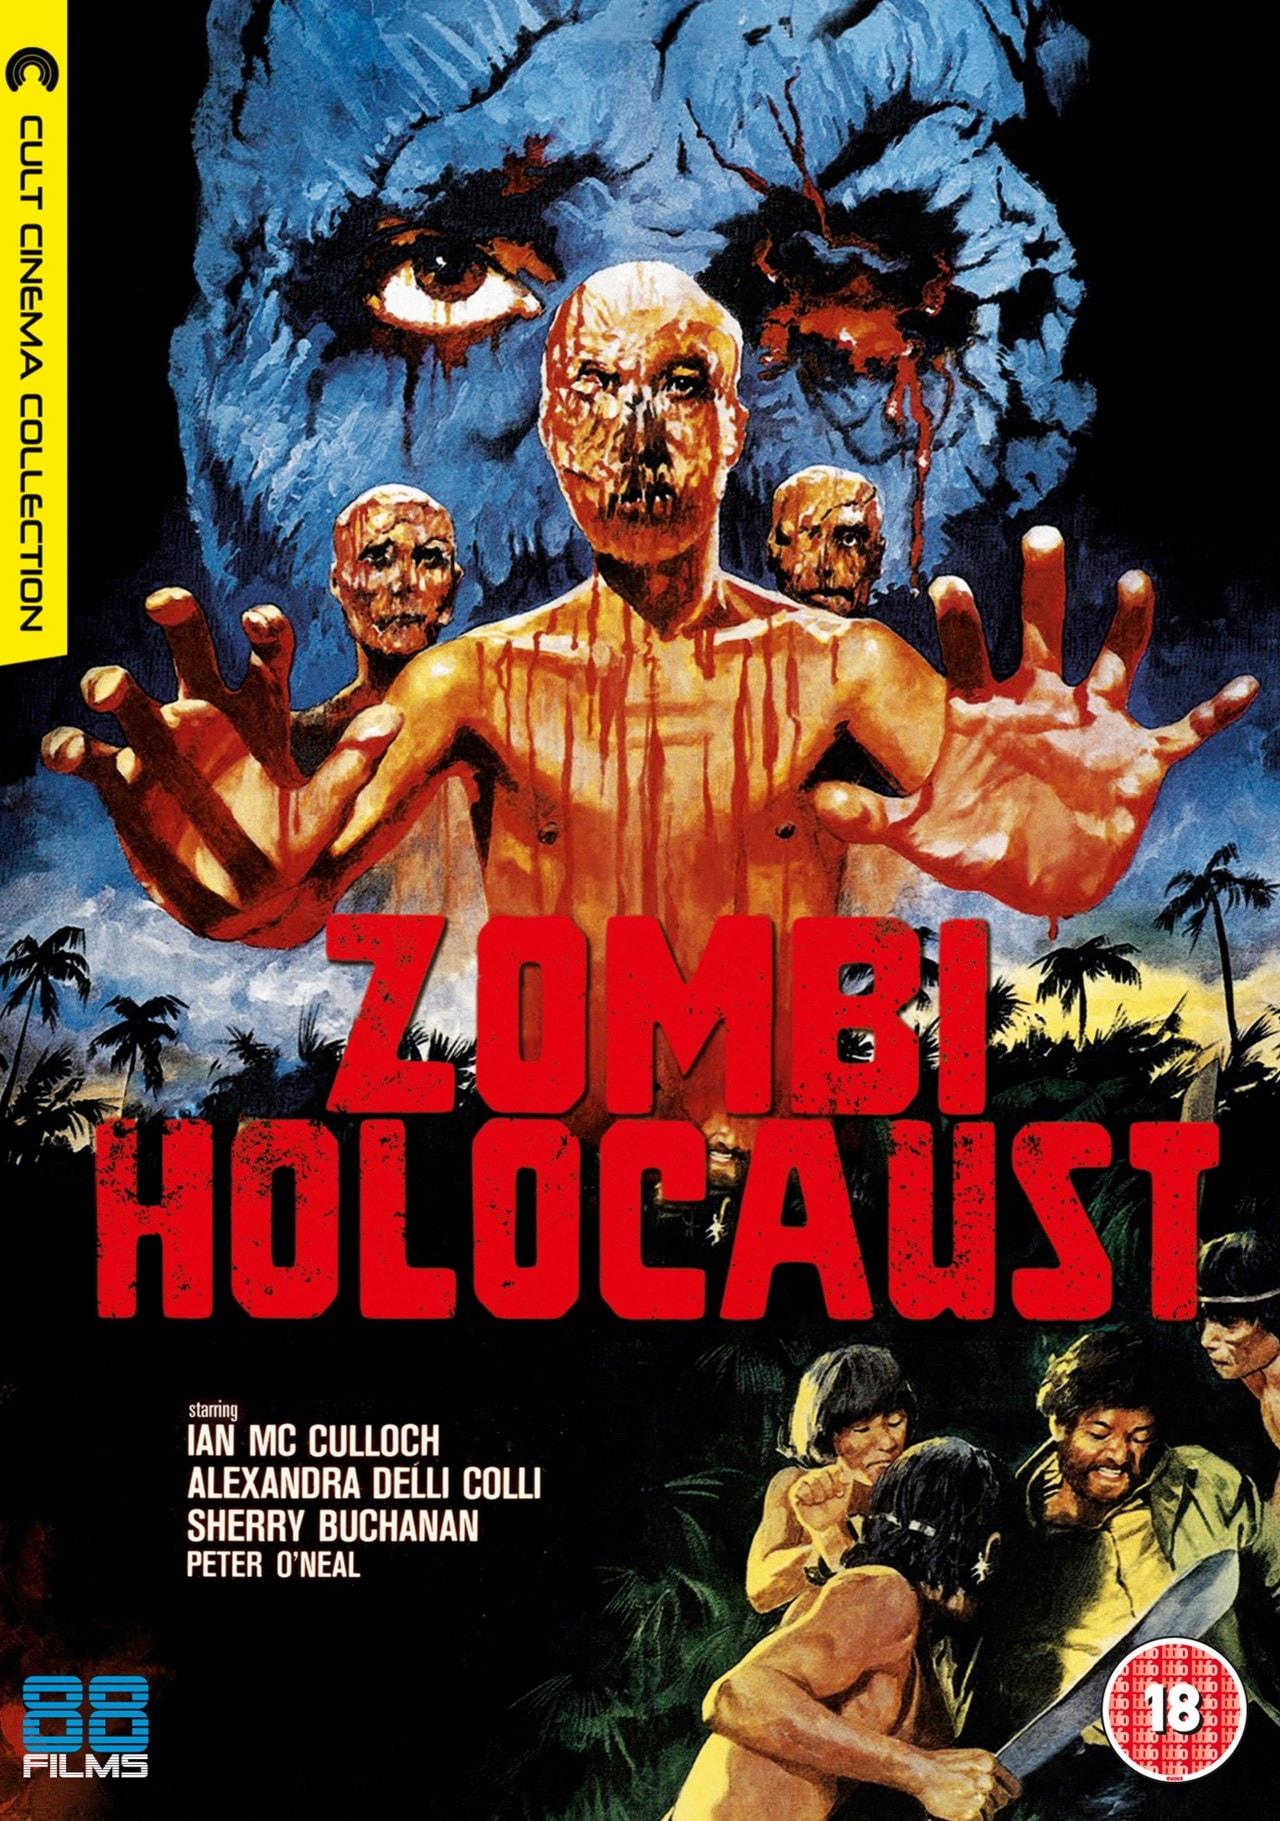 Zombi Holocaust - 1